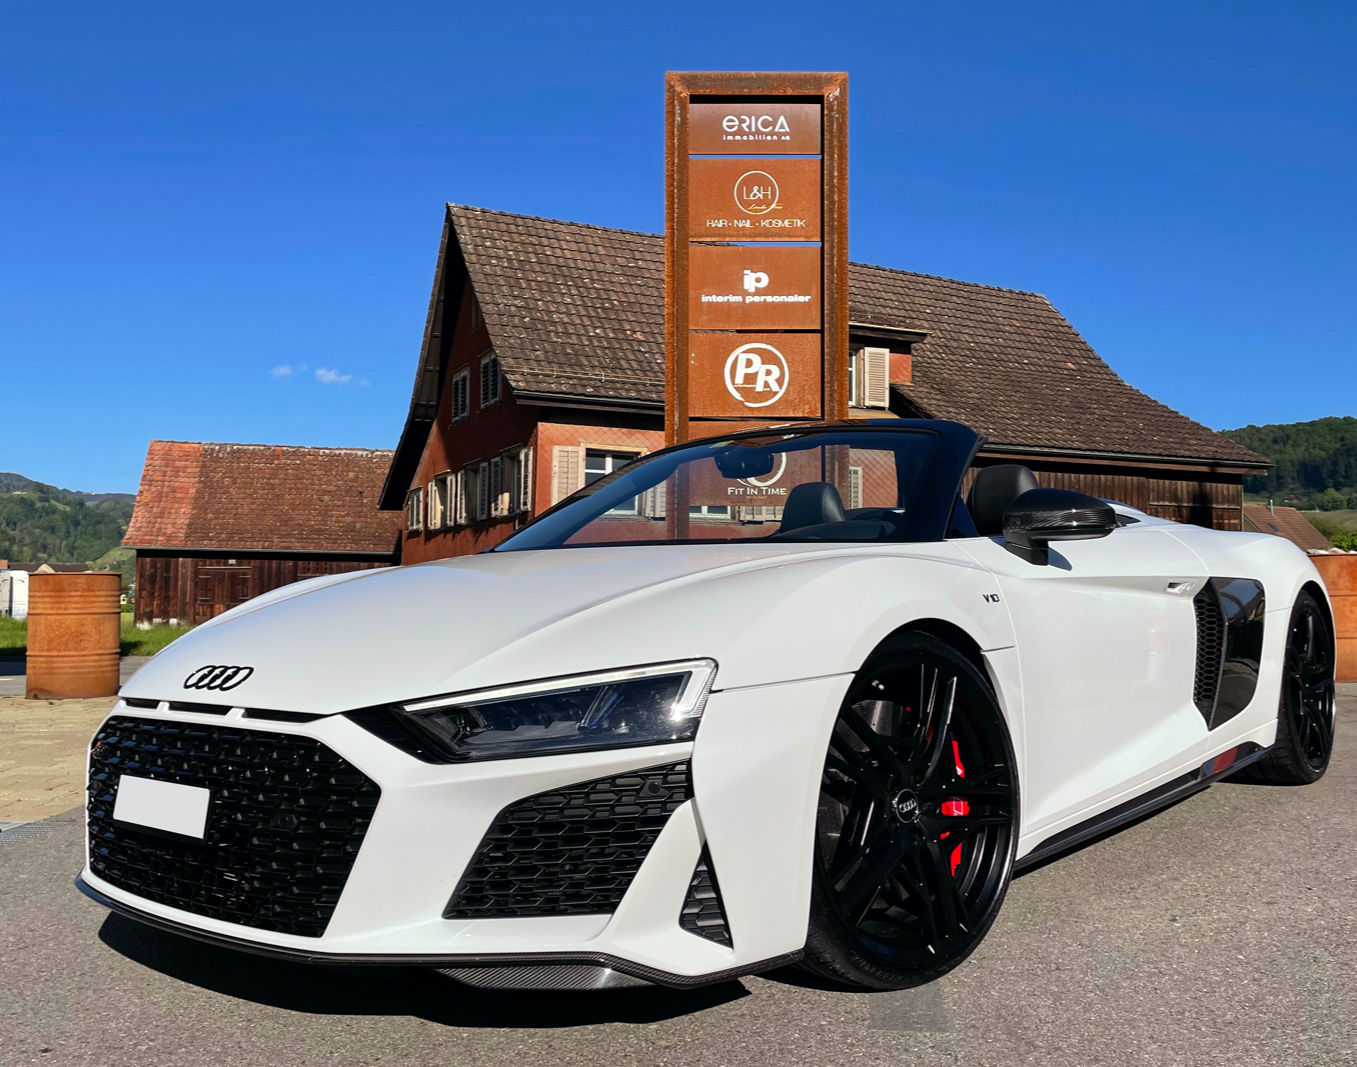 Audi R8 V10 Plus - 6 Stunden Audi R8 Spyder V10 Performance - 6 Stunden